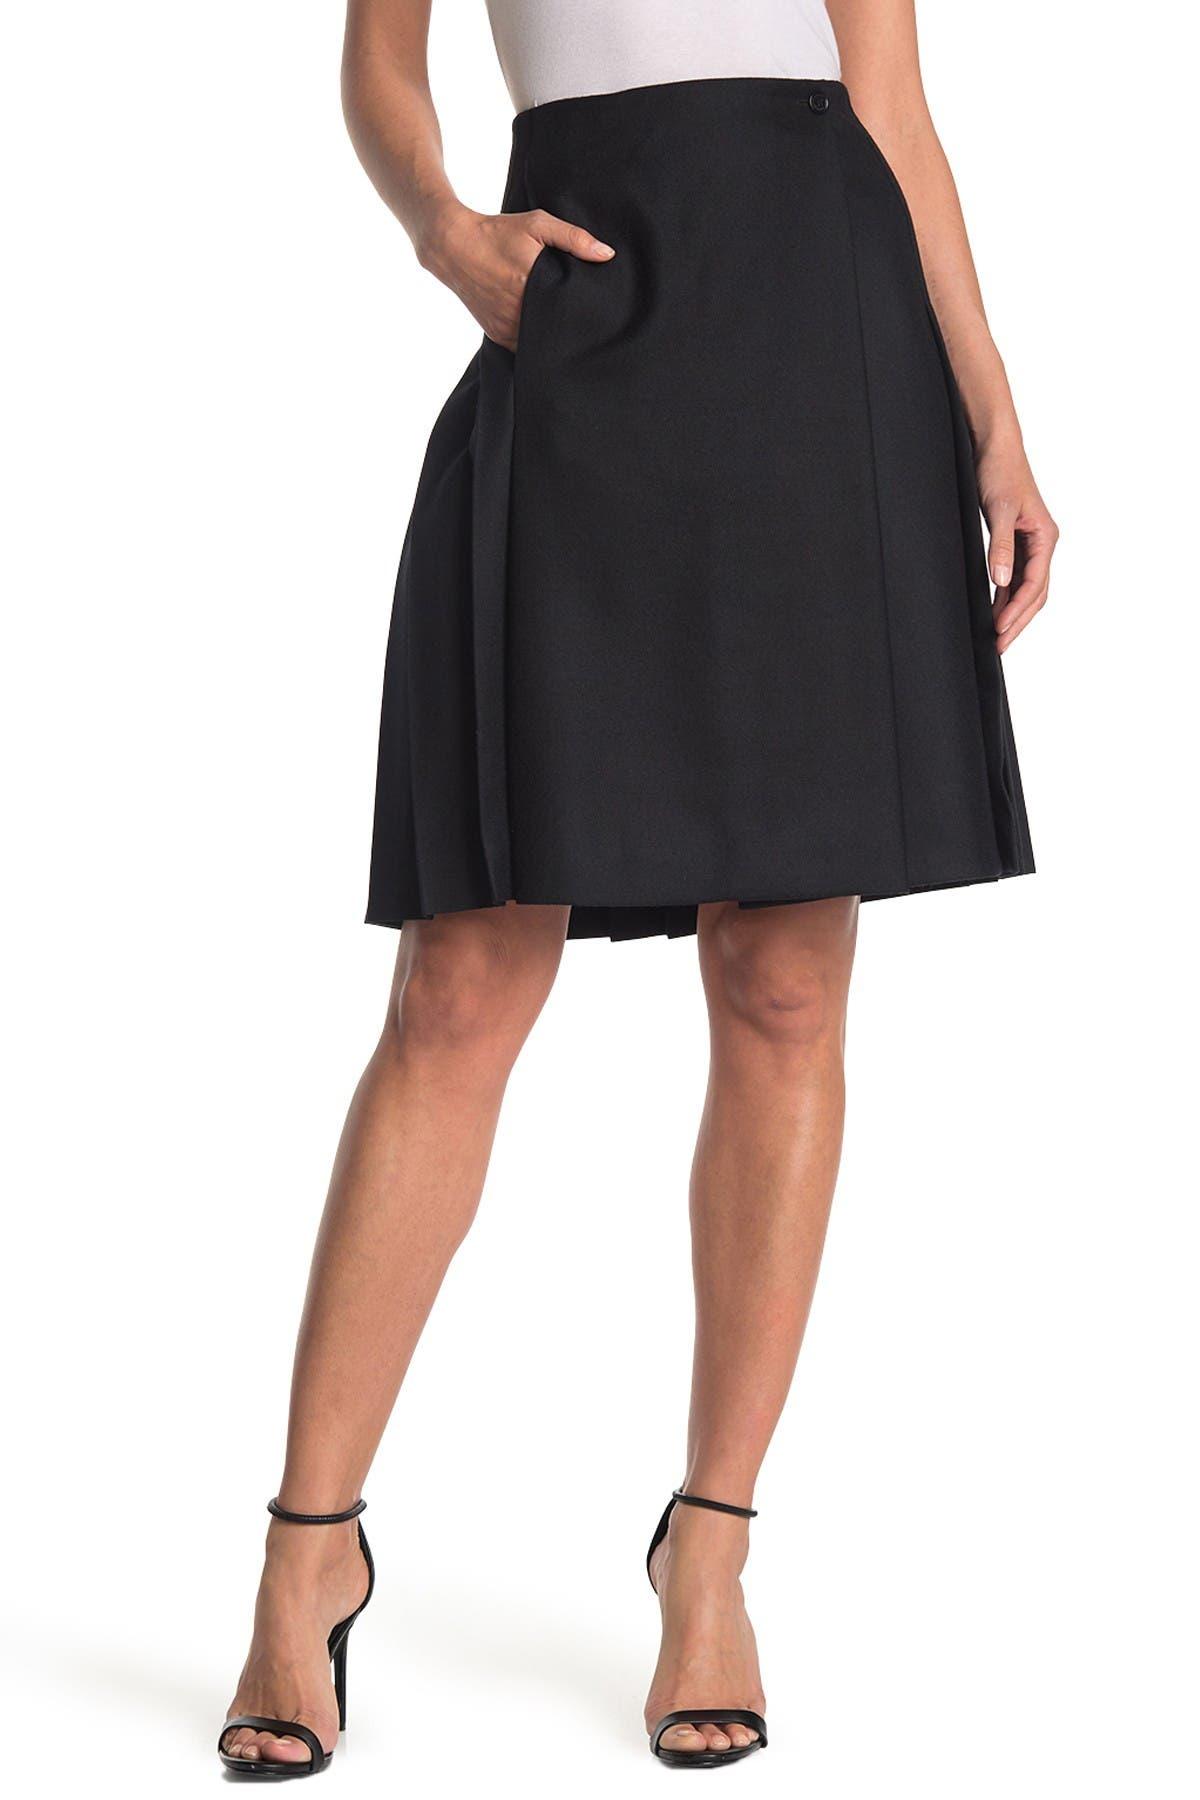 Image of Burberry Wool Skirt